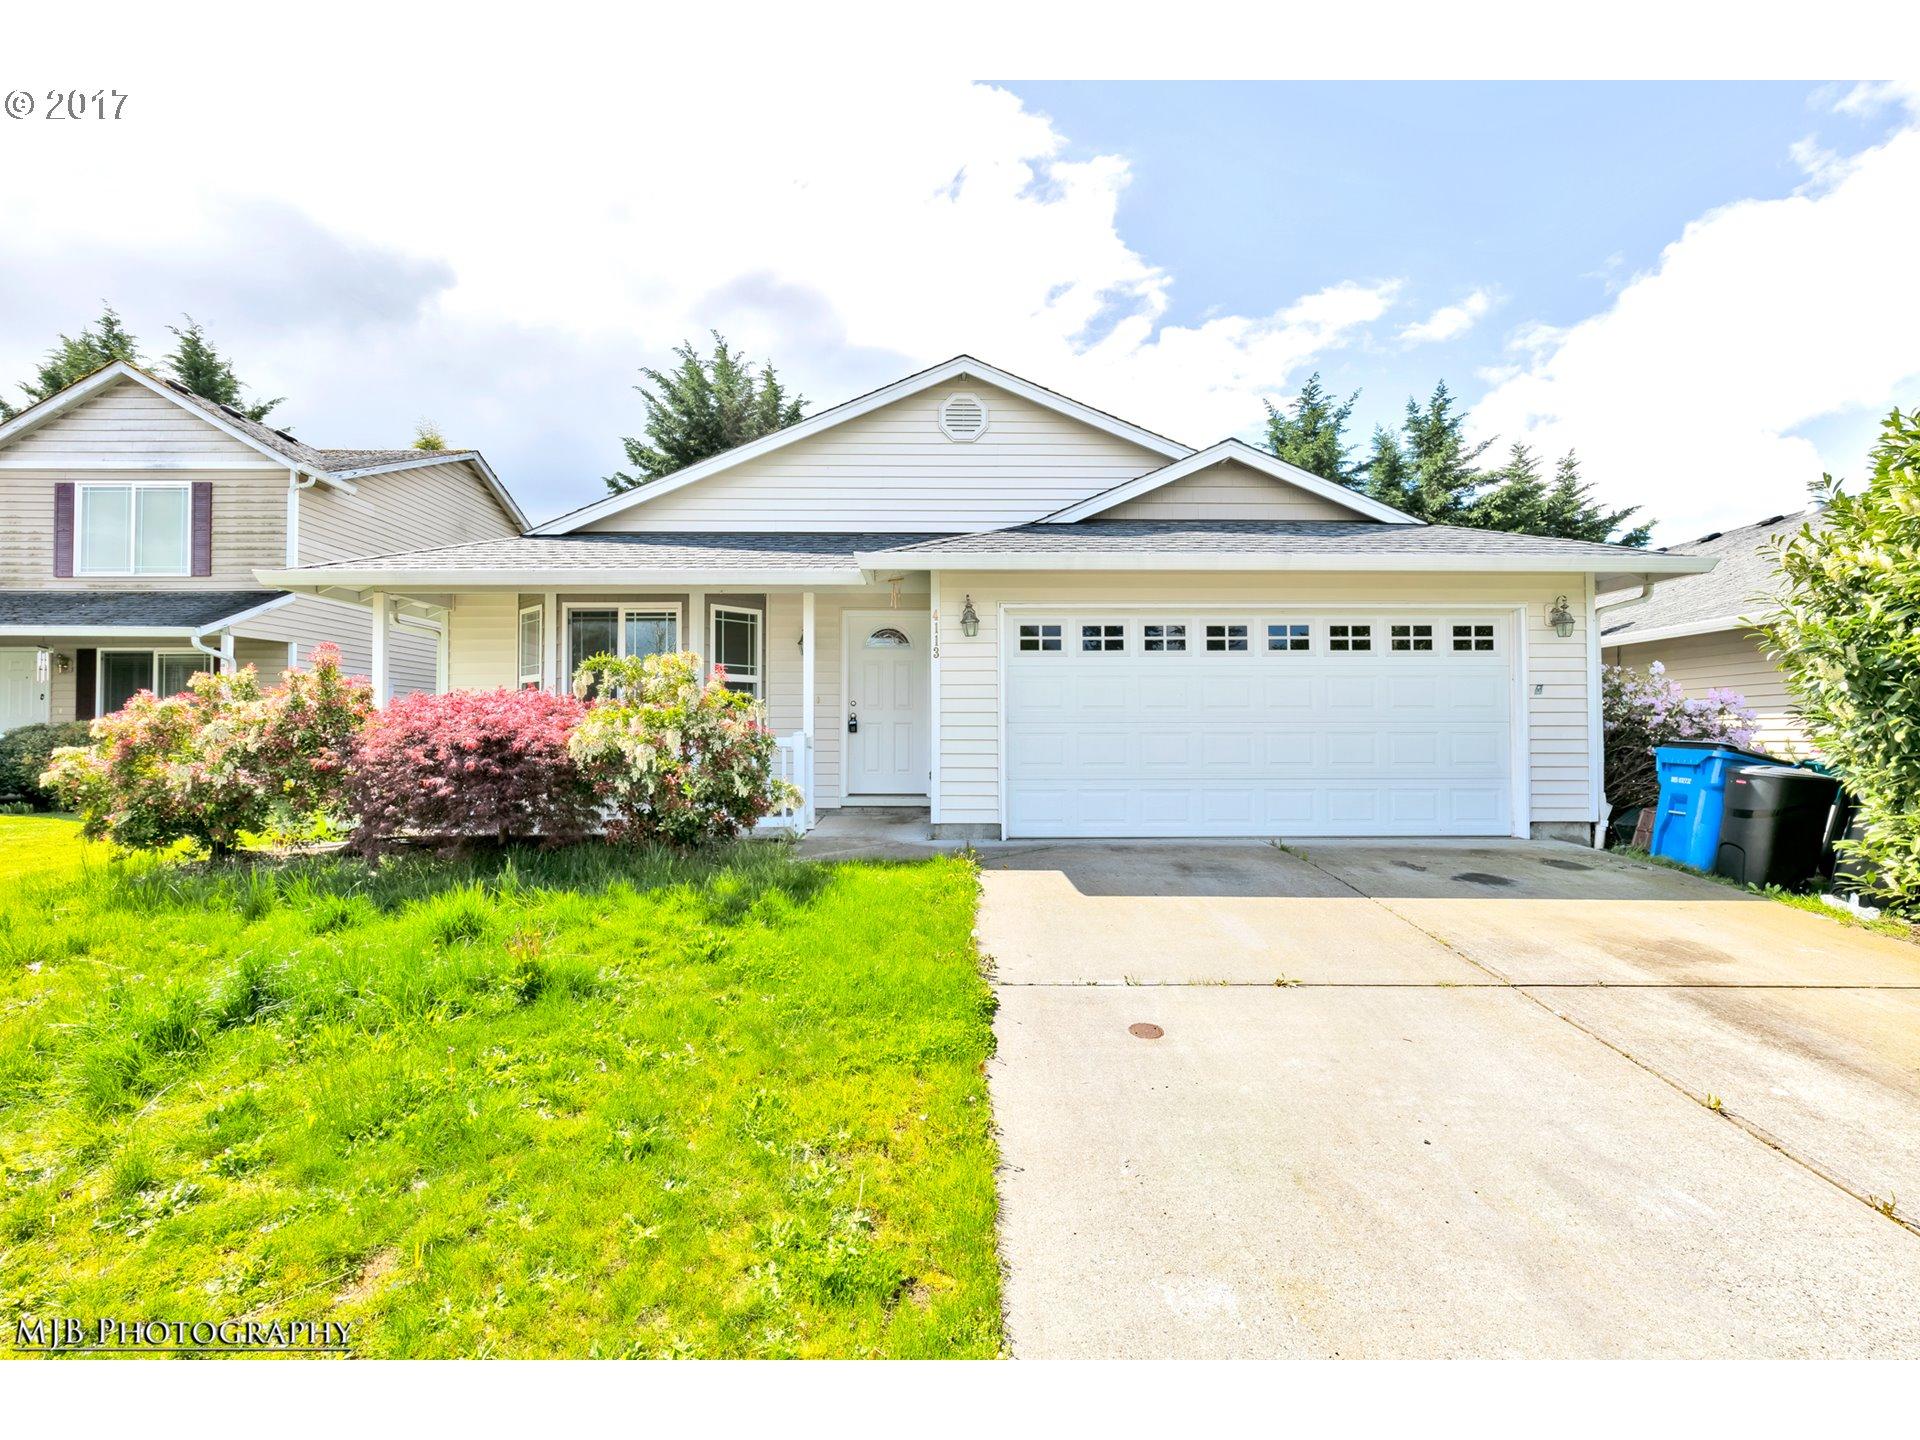 4113 NE 117TH ST, Vancouver, WA 98686